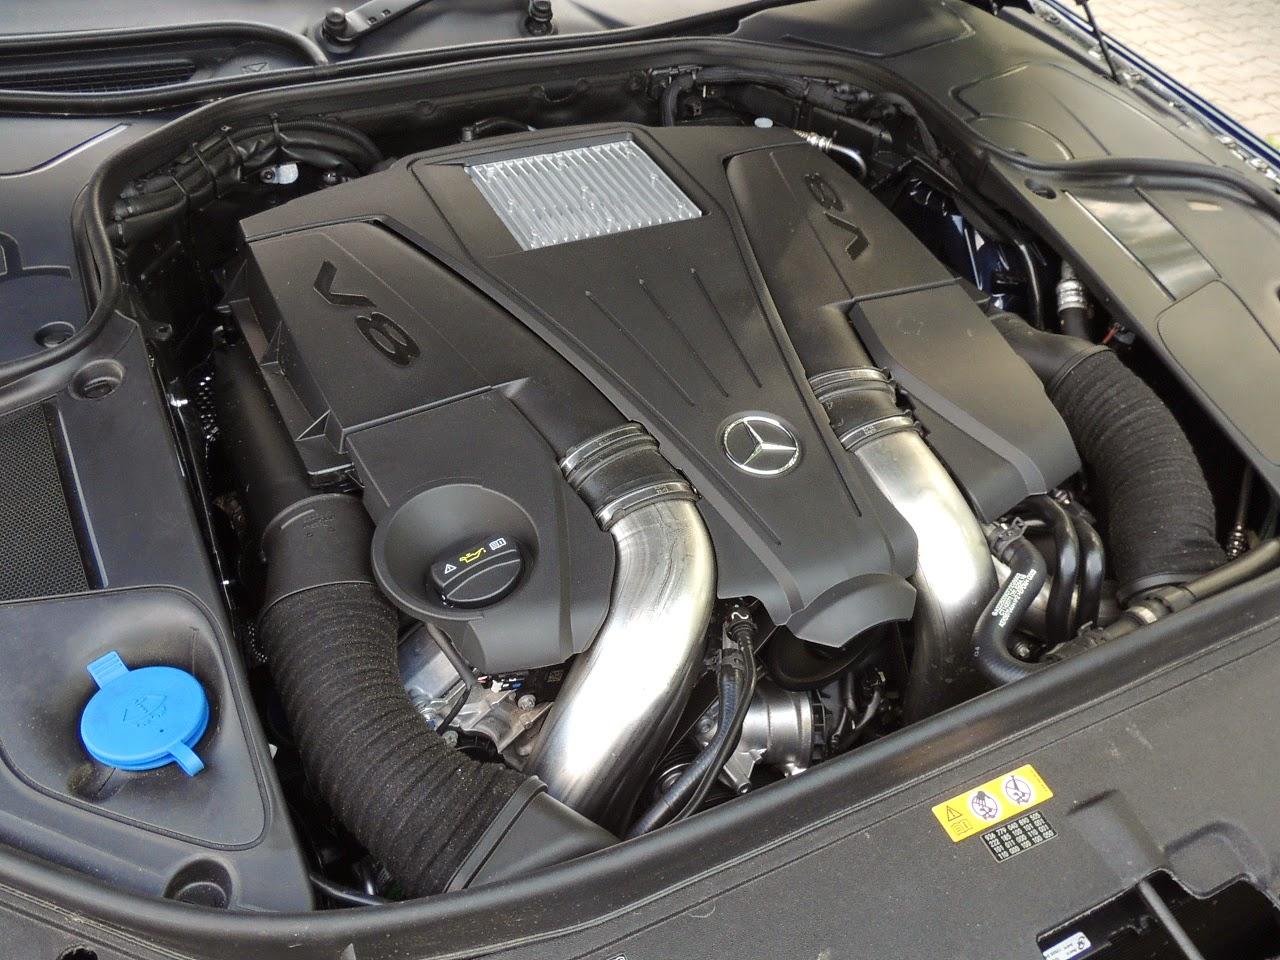 Mercedes S 500 L 4MATIC - silnik 4.7 V8 Biturbo